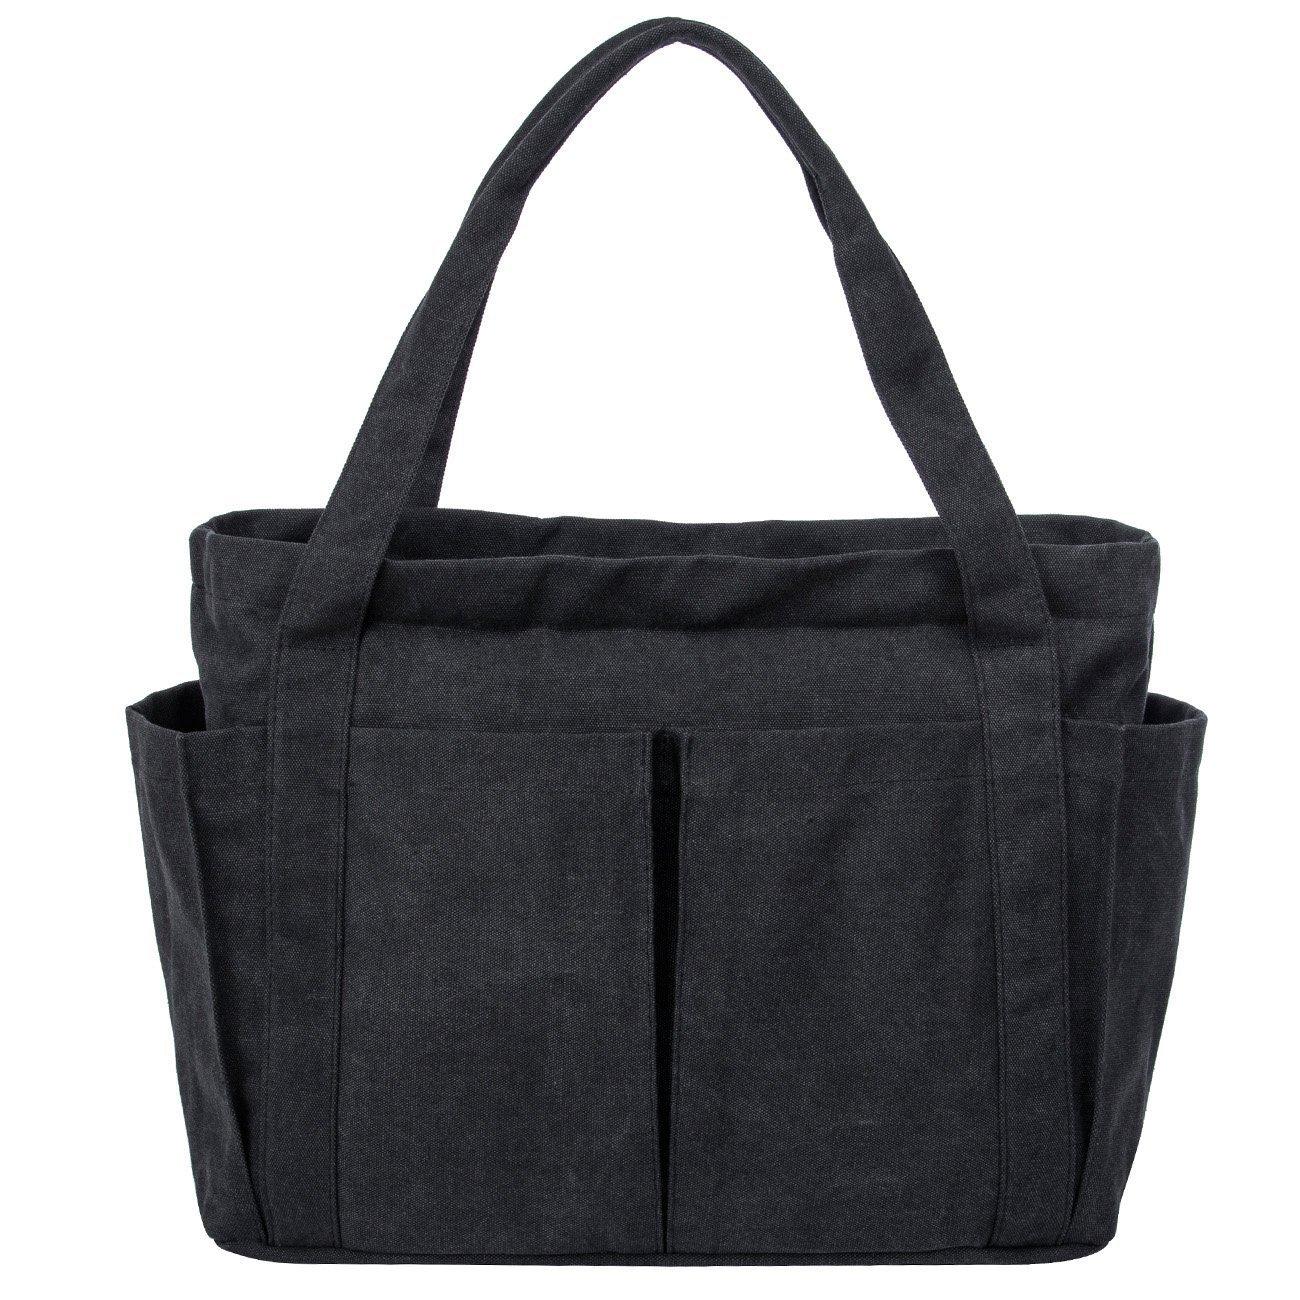 Canvas Shoulder Bag Large Beach Travel Shopper Tote Bag Casual Handbag Carry All Shopping Bag Hobo Style (Black)